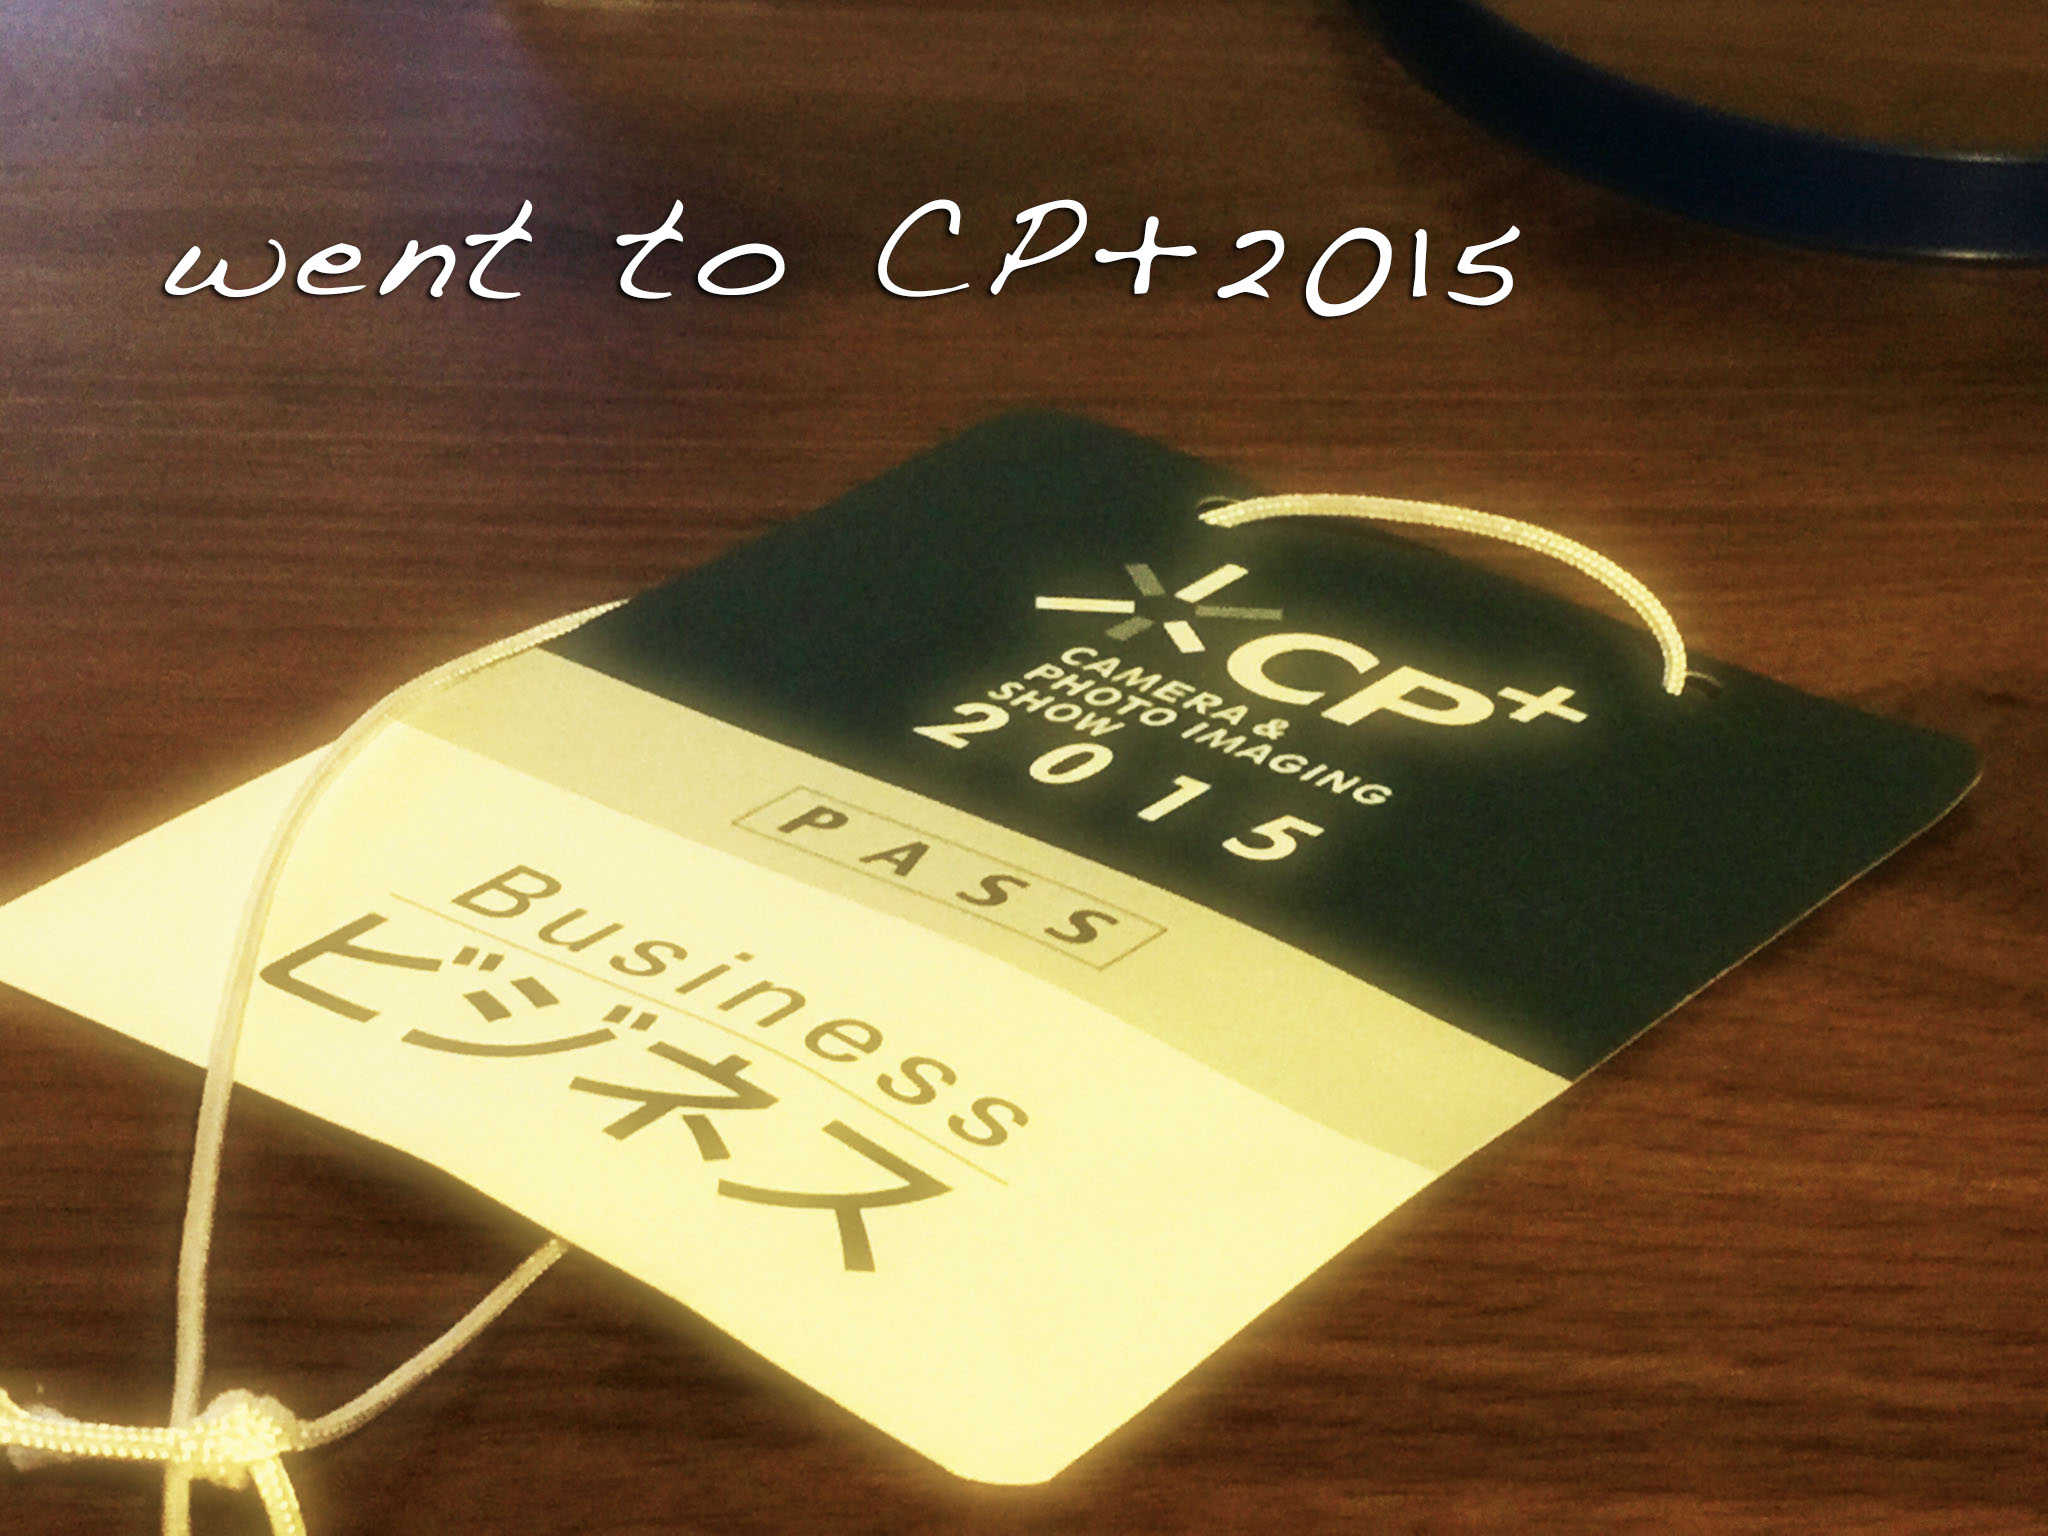 CP+2015に行きました (気になっているカメラOM-D E-M5 mark2)